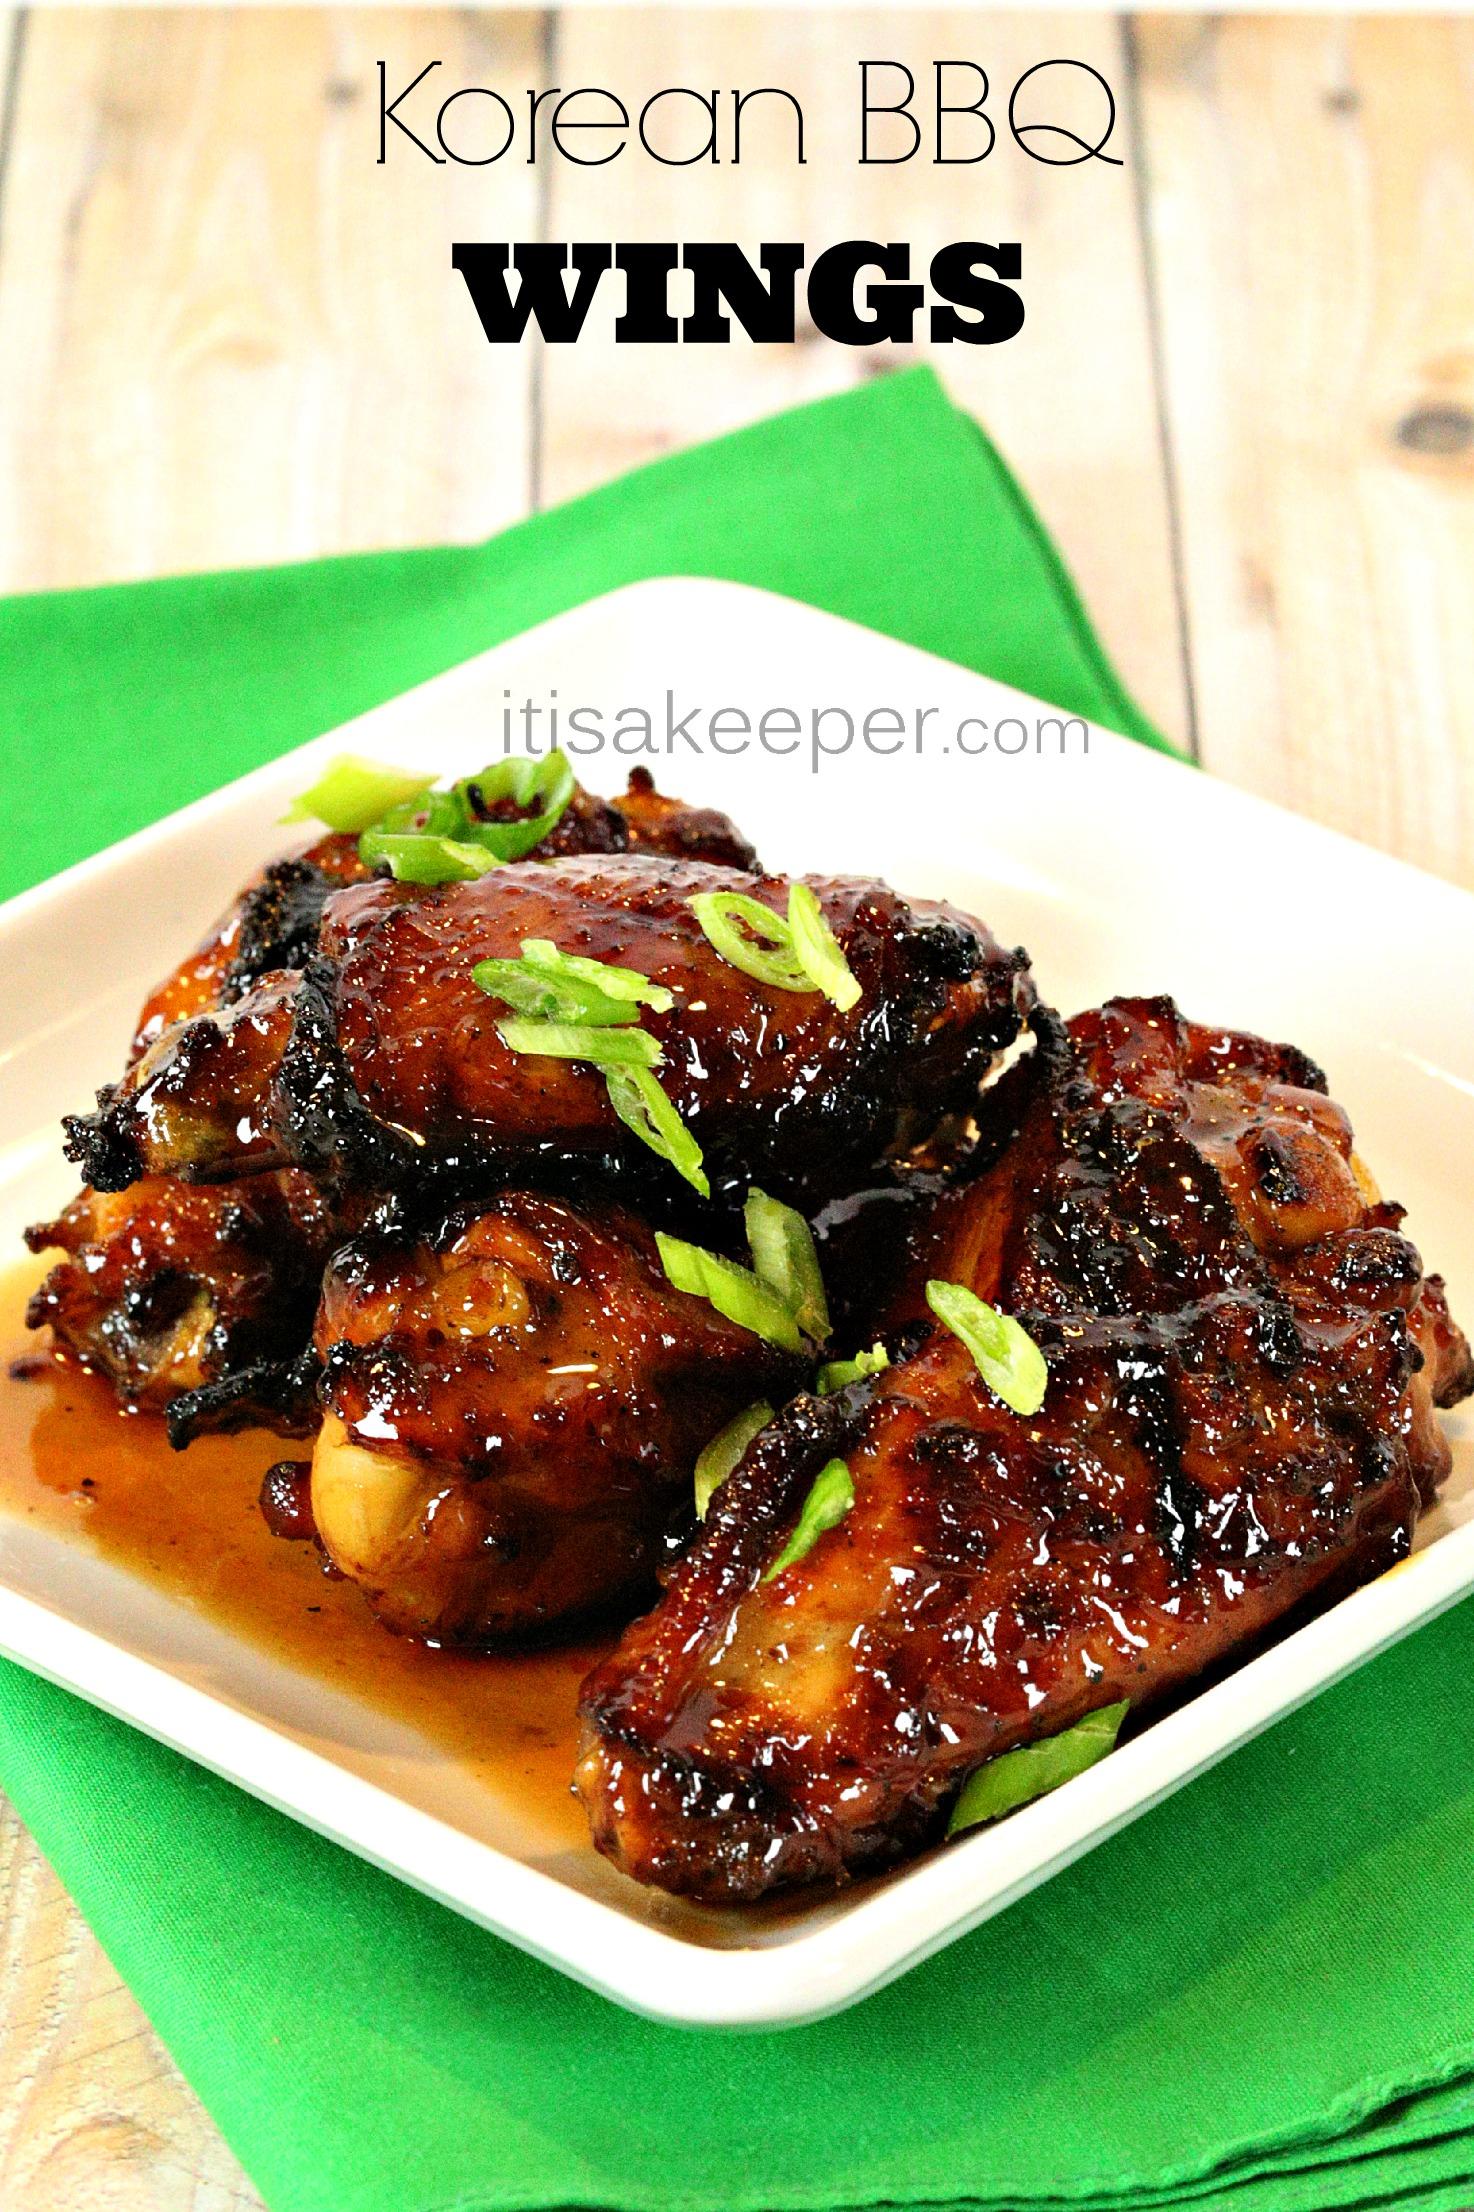 Korean Pork Chops - Easy Baked Boneless Pork Chop Recipes